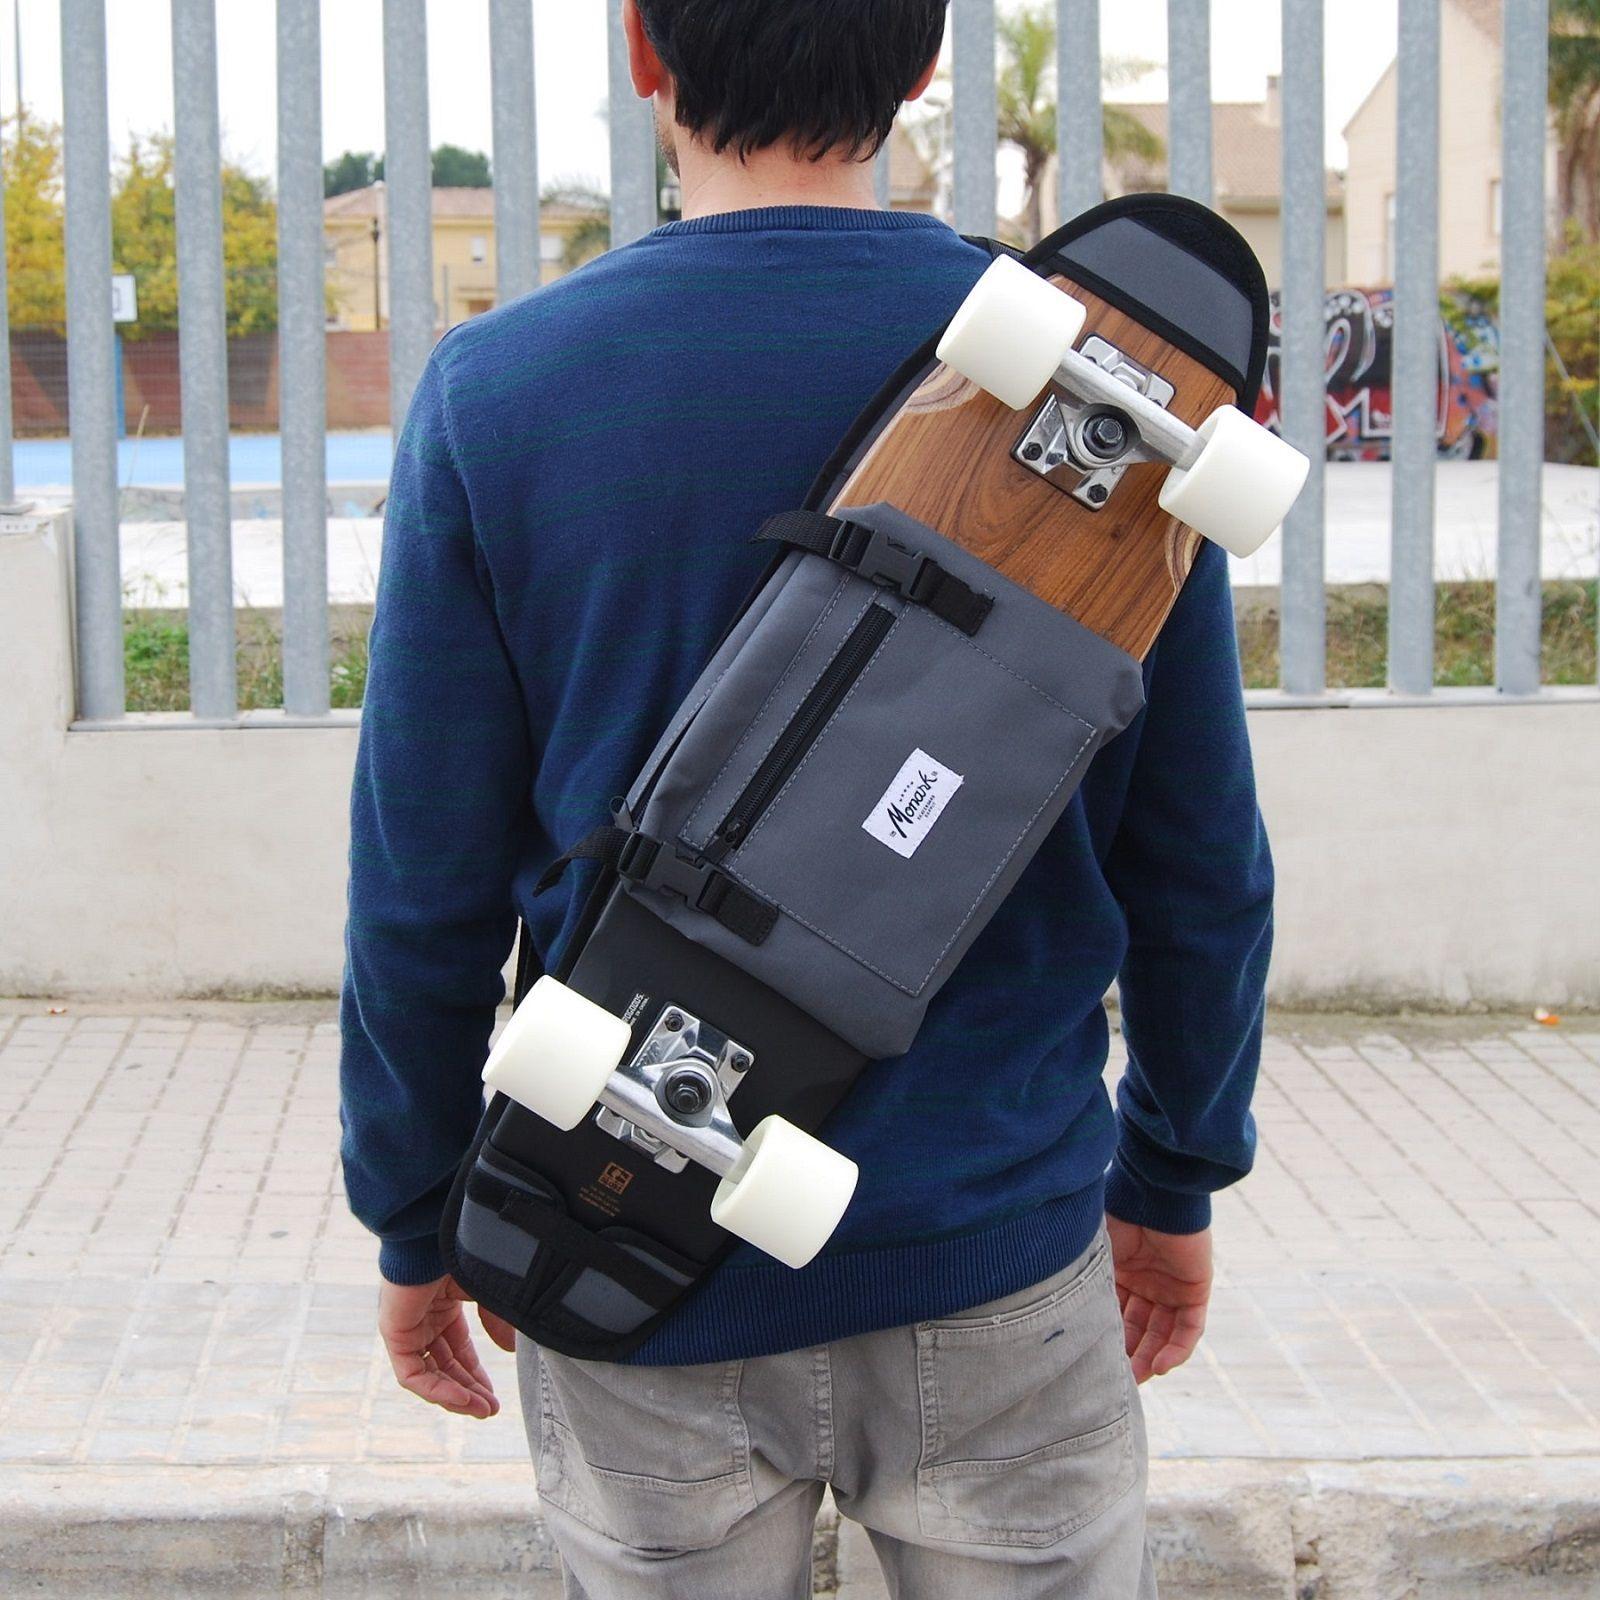 Pin On Skateboard Backpack Cruiser 26 And 27